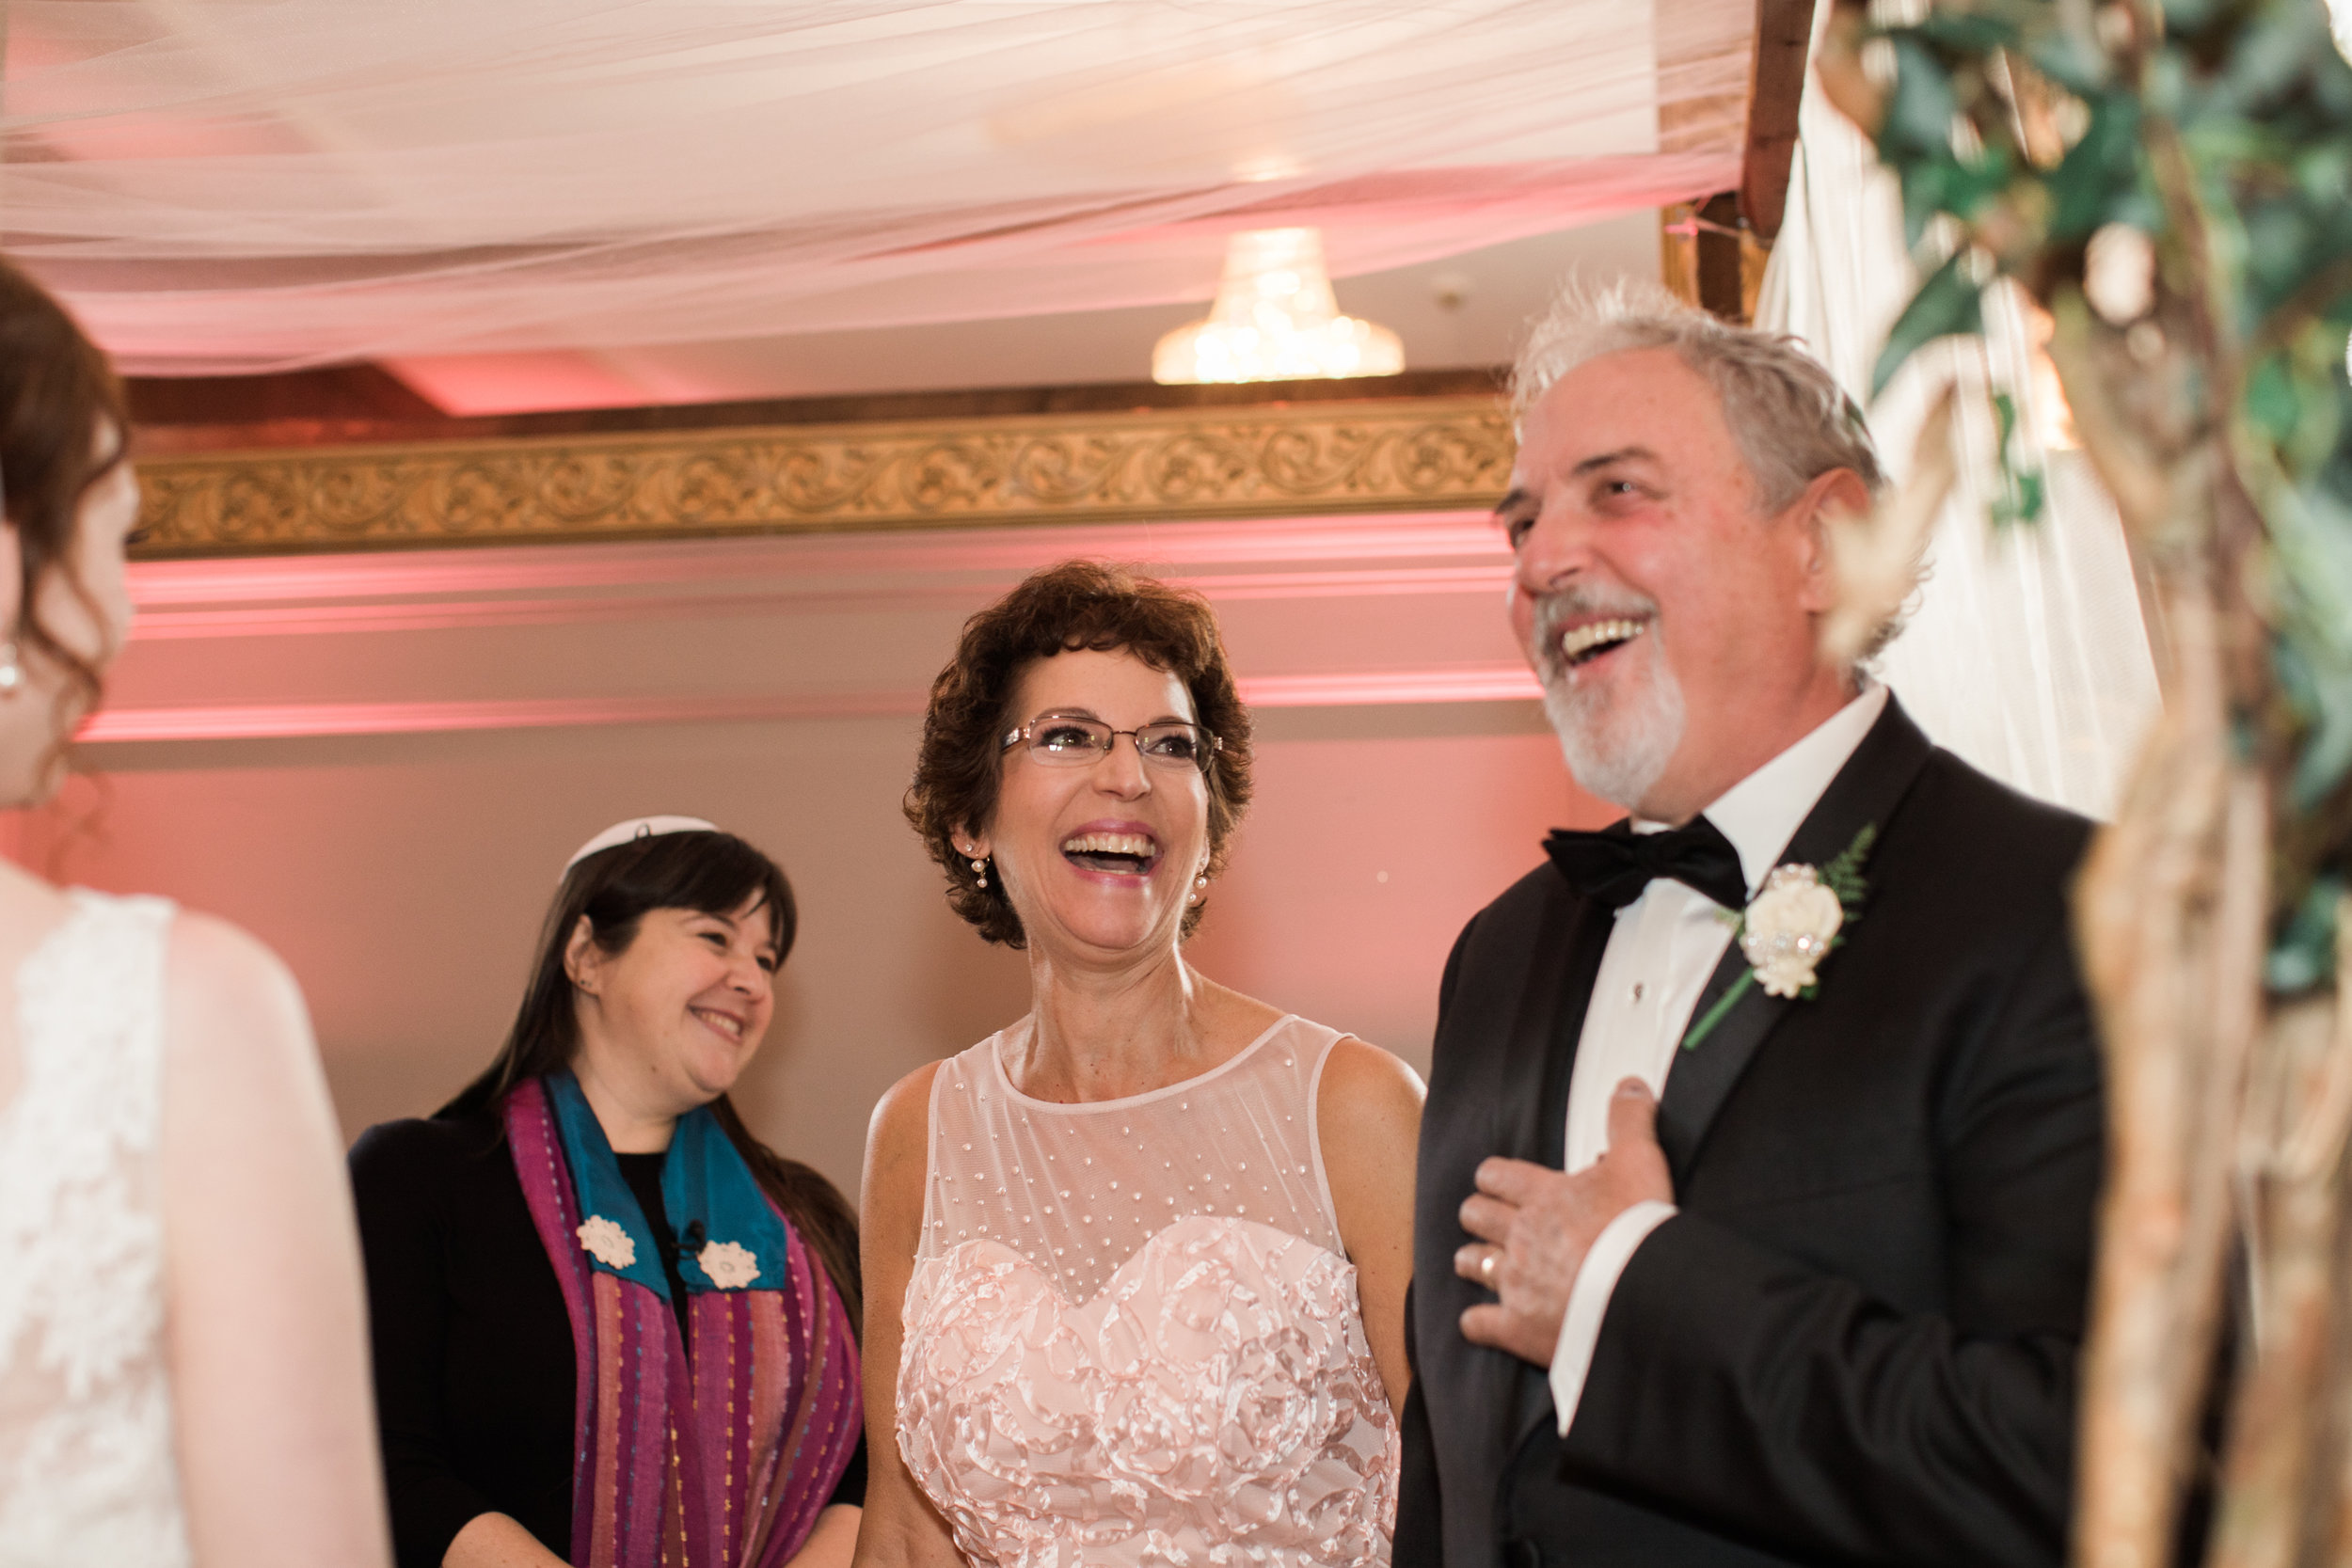 Harry Potter Wedding at Overhills Mansion Catonville Maryland Wedding Photographers Megapixels Media (71 of 134).jpg